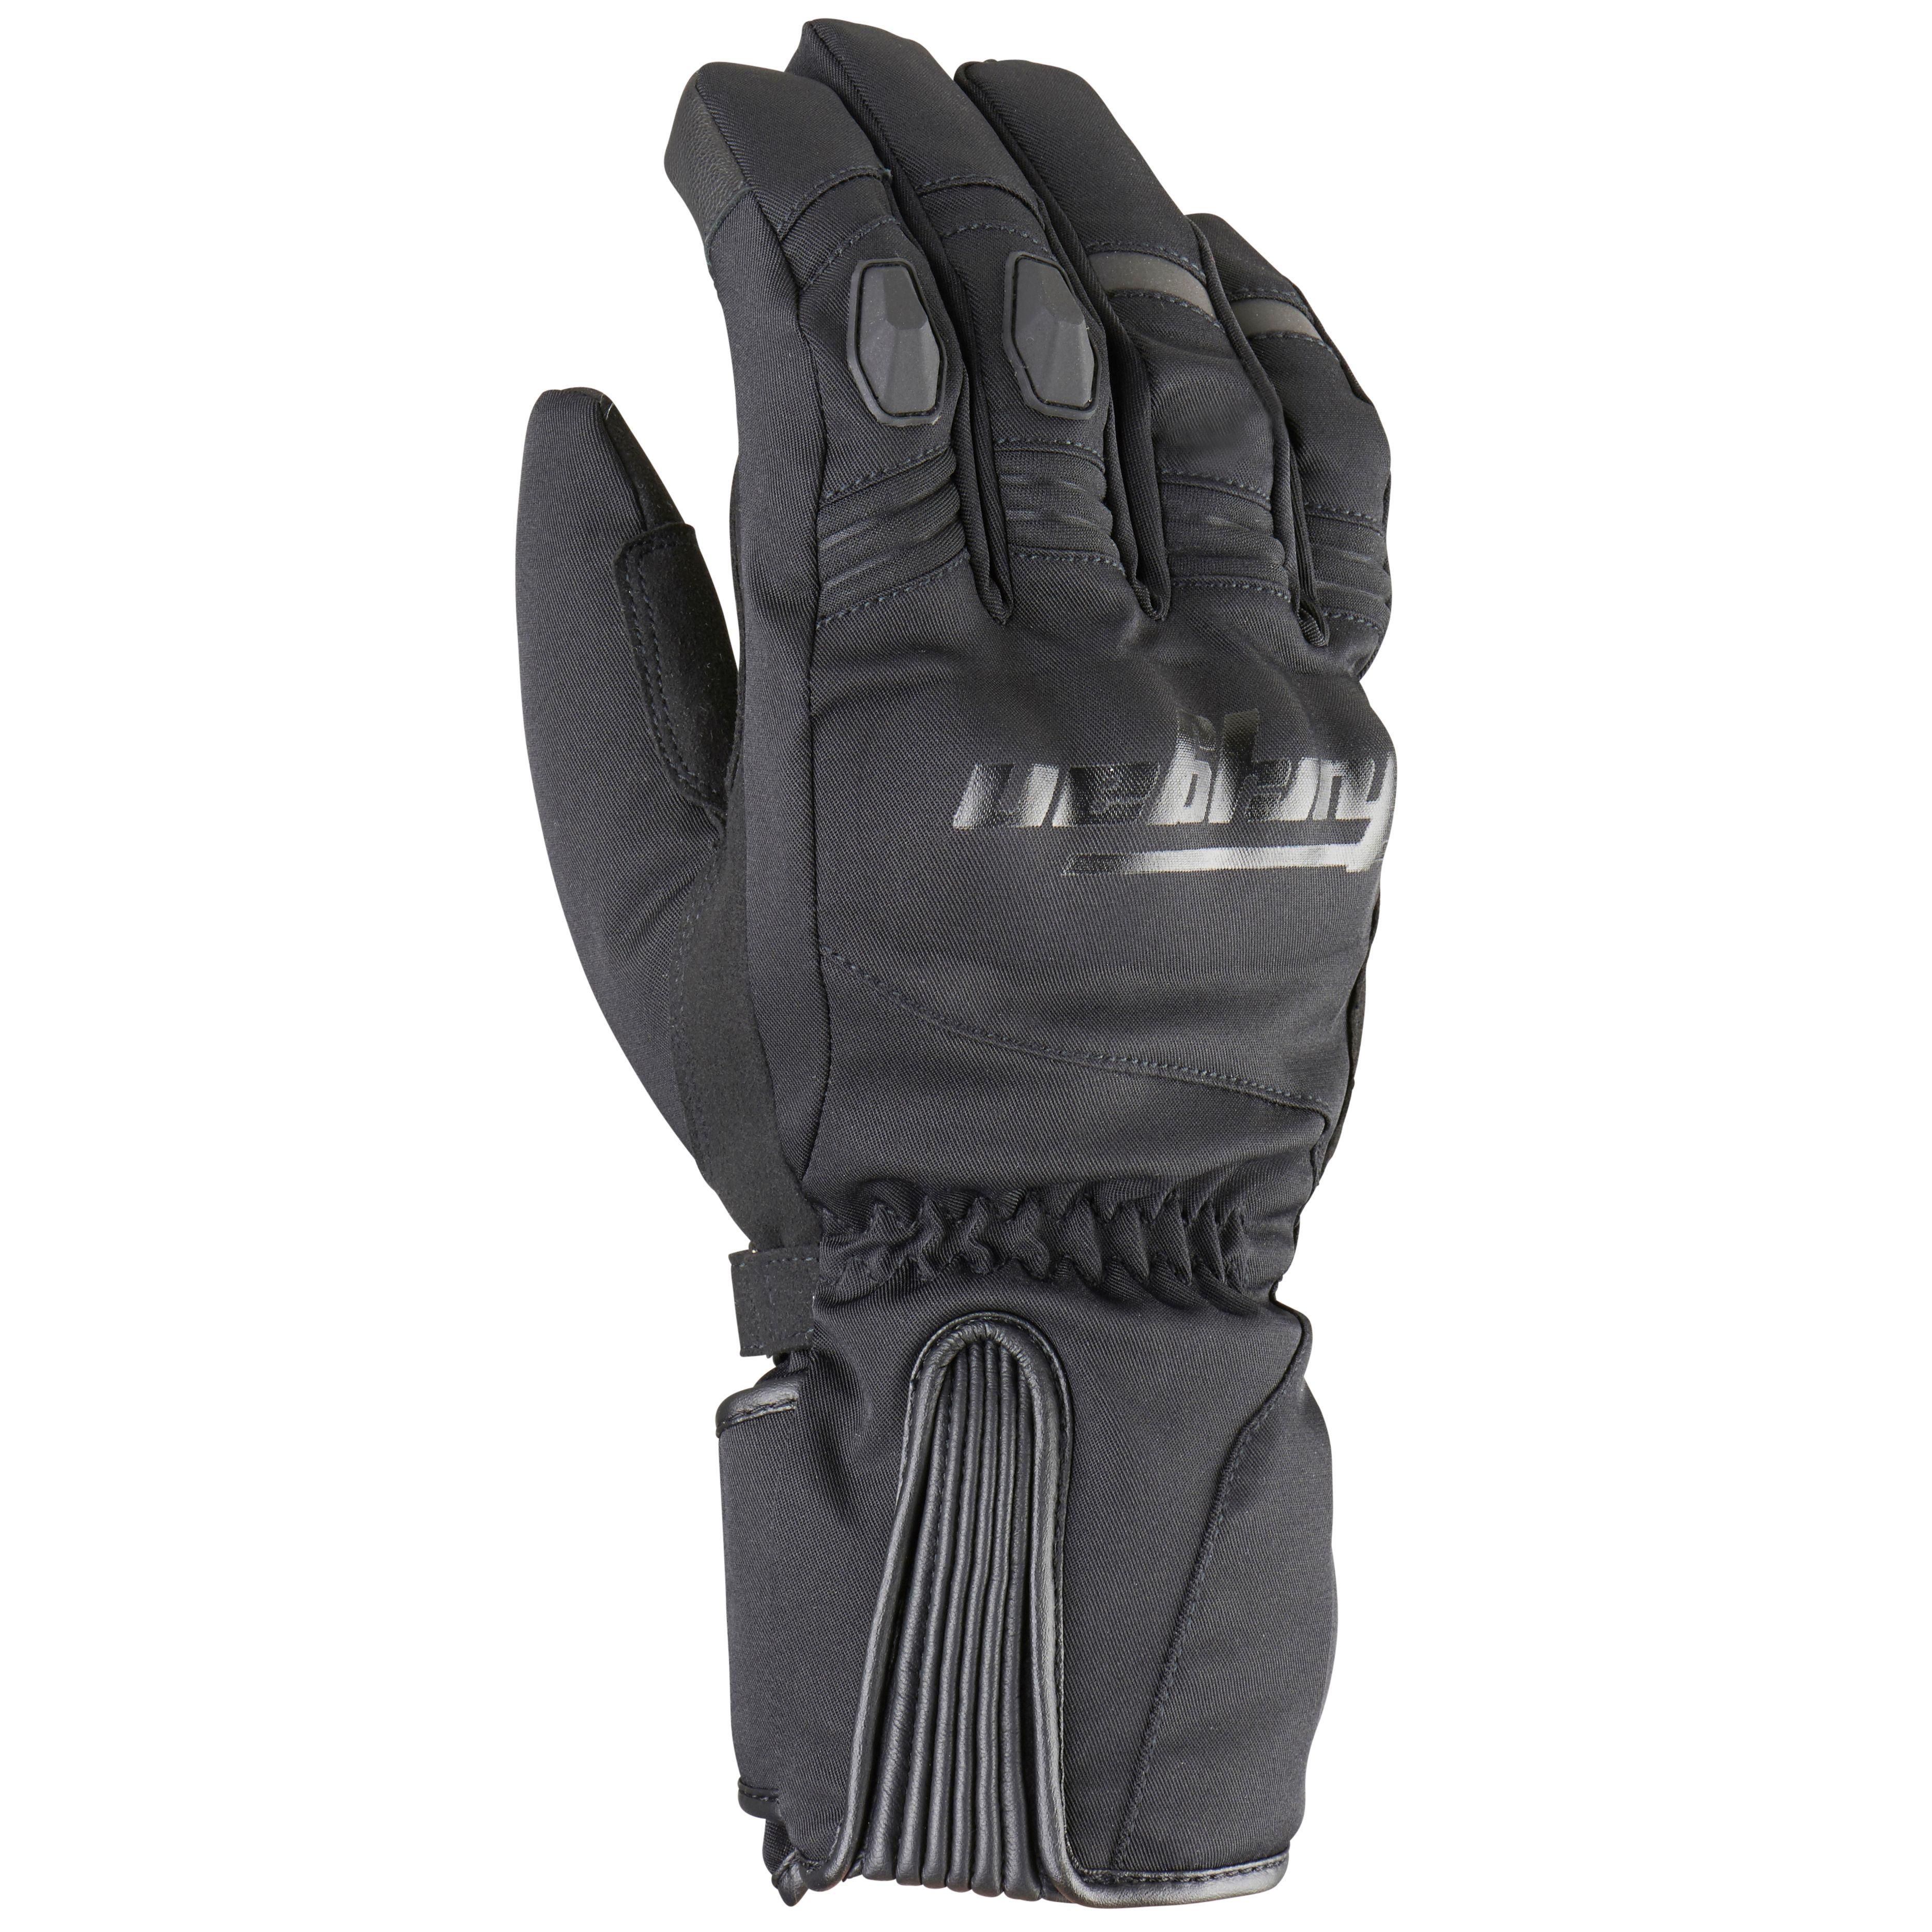 gants textile chaud hiver furygan zeus noir s team motos. Black Bedroom Furniture Sets. Home Design Ideas